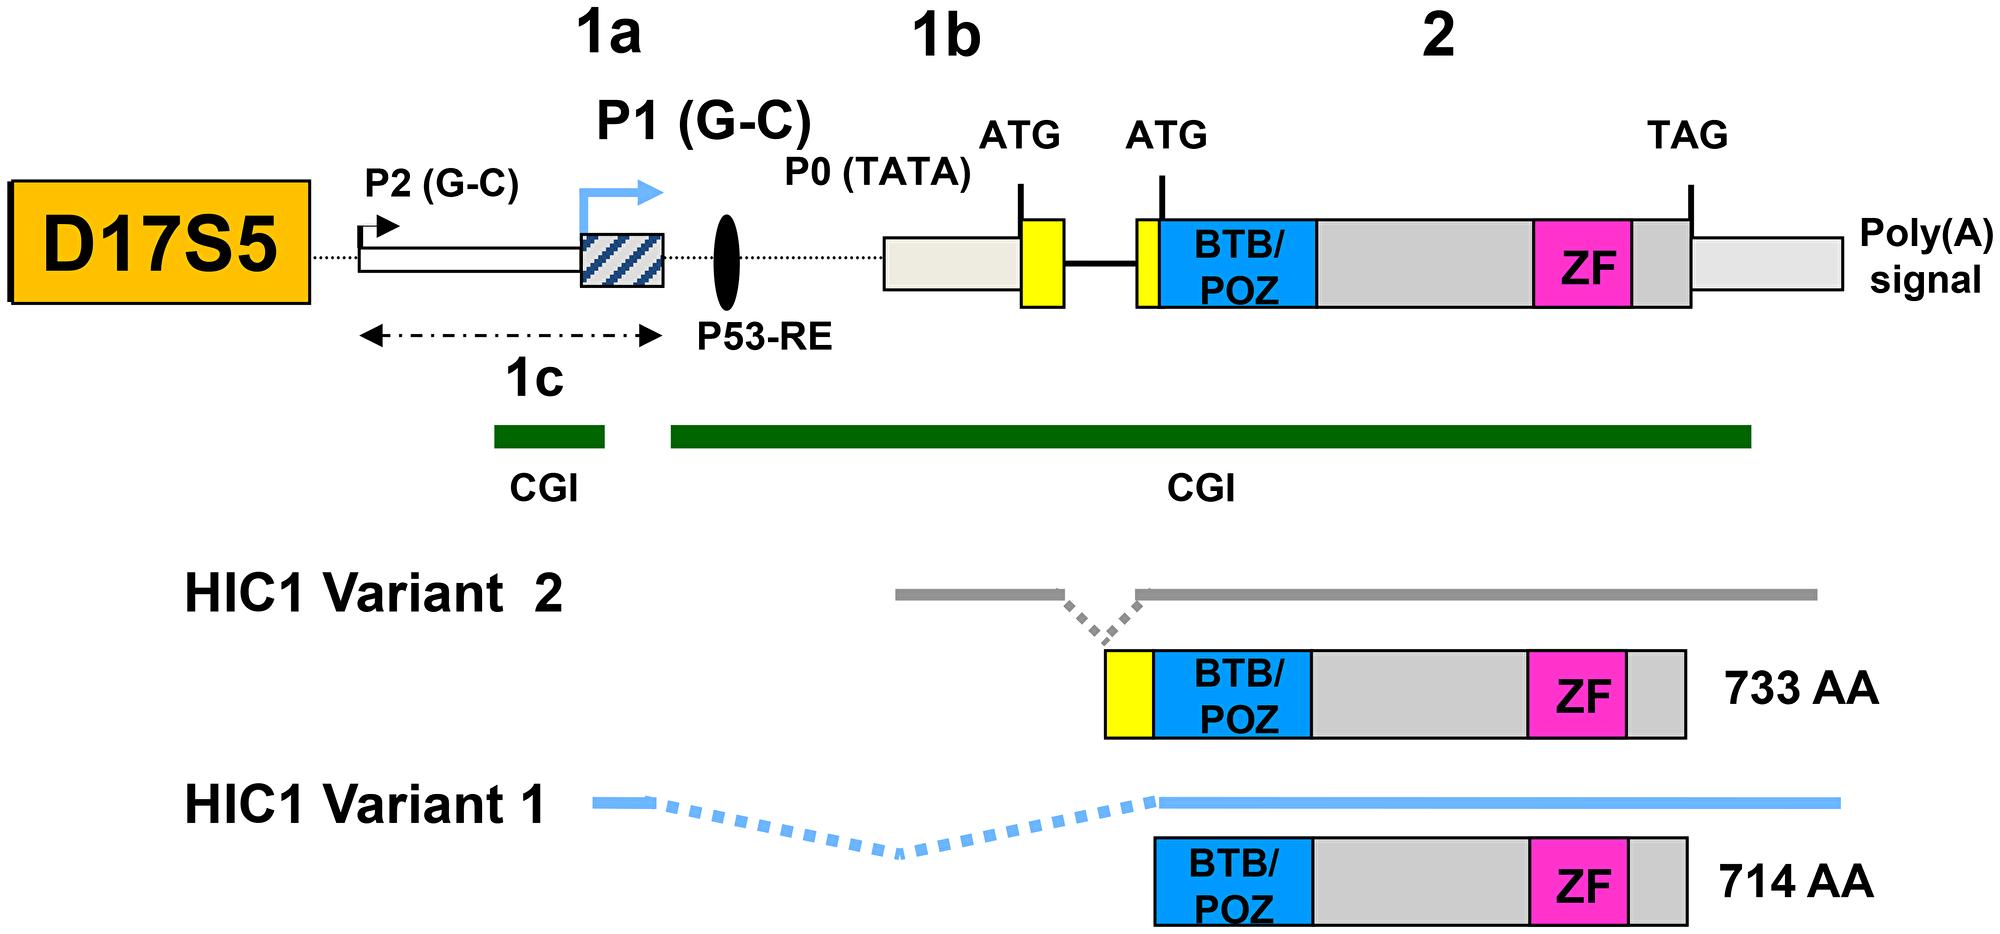 Genomic organization of the human HIC1 locus.